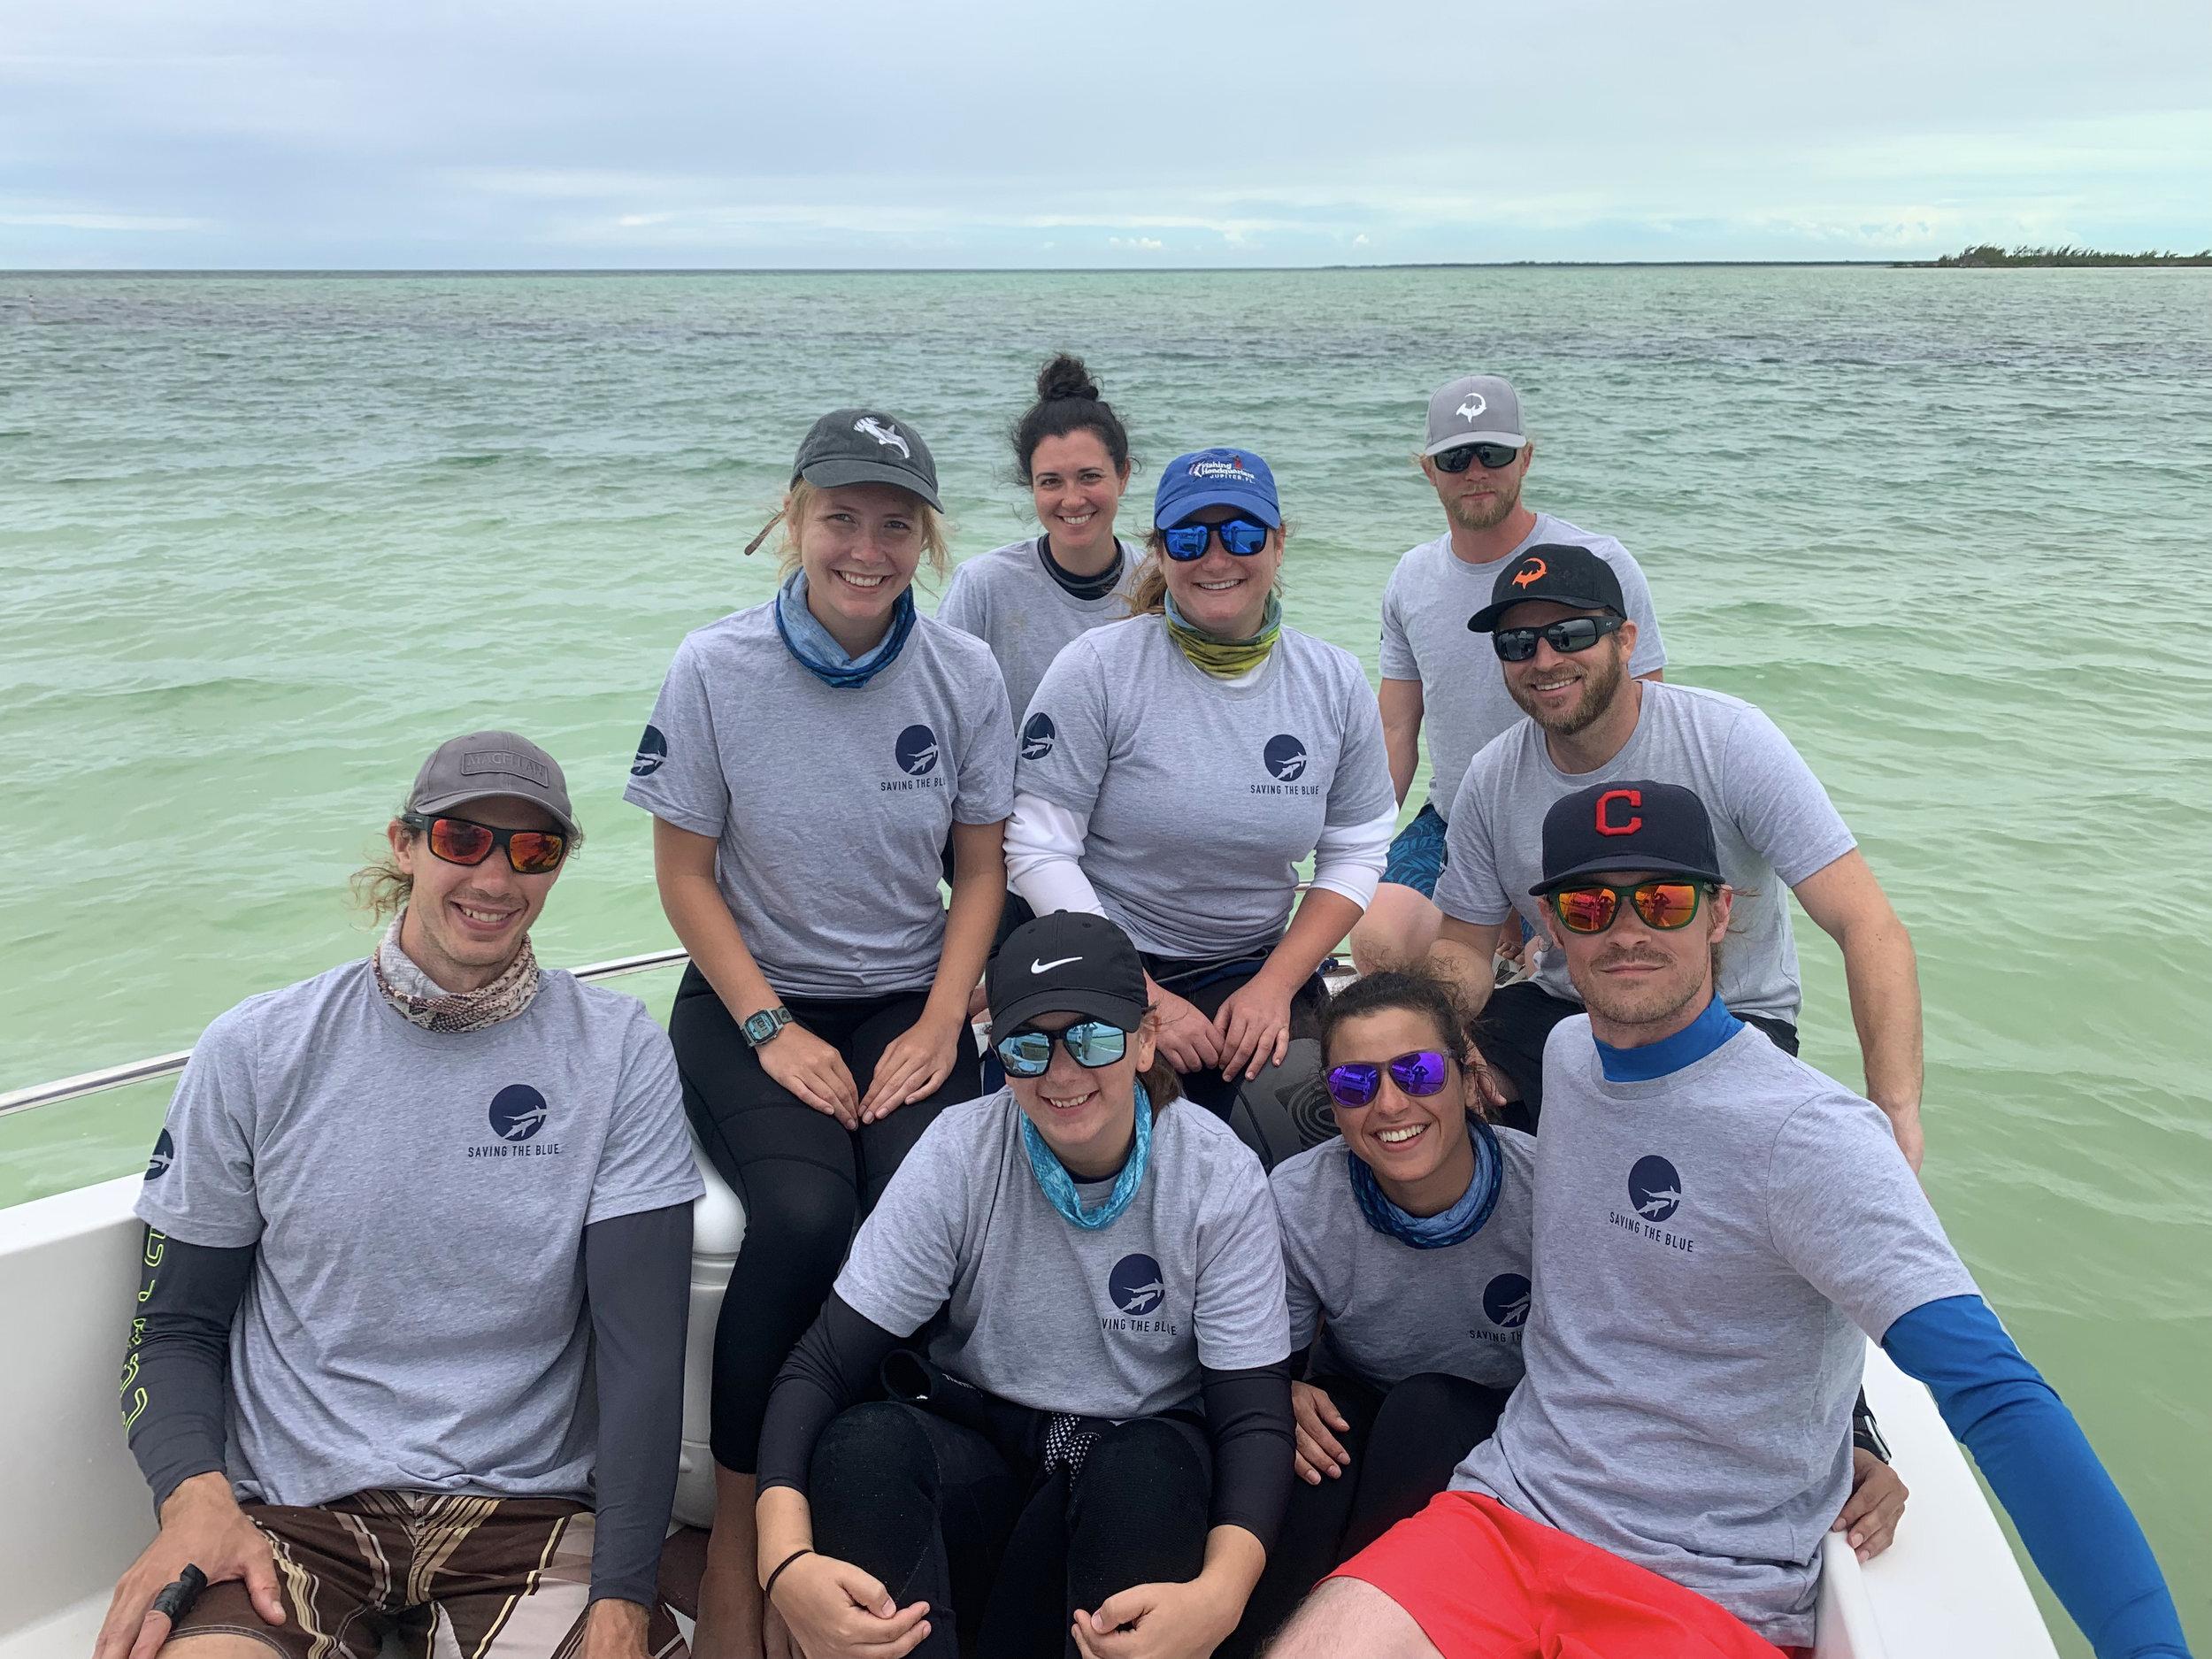 Saving the Blue - Dr Tristan and Annie Guttridge - Nonprofit - Shark Research - Shark - Sharks - The Bahamas.jpg